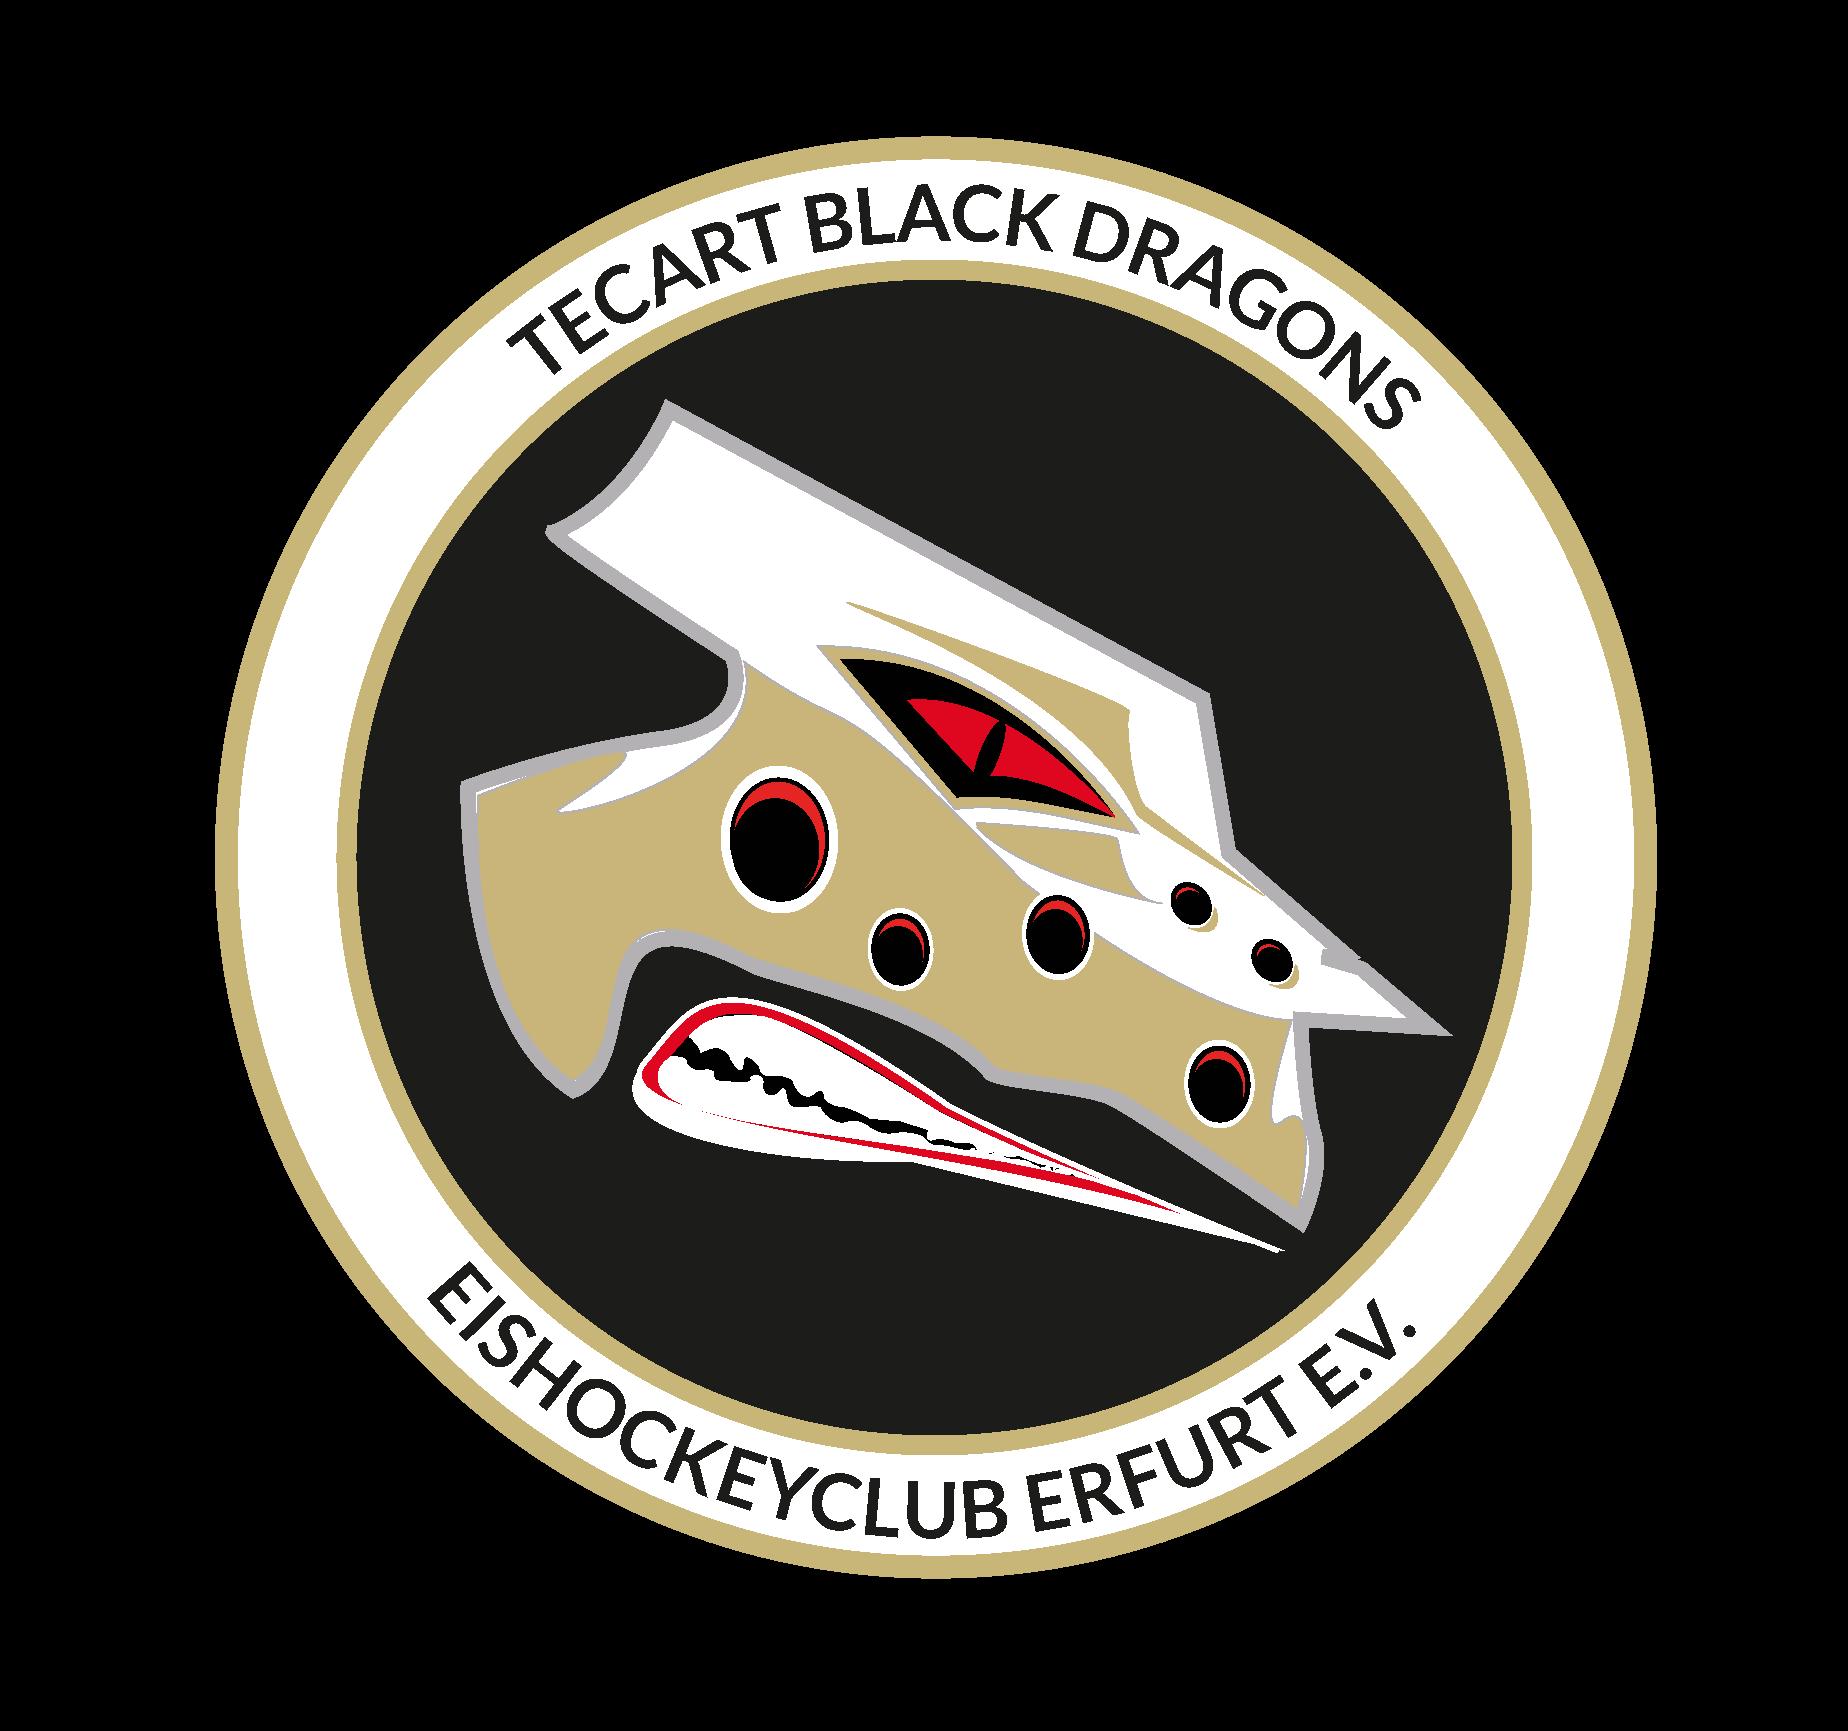 persoperm Logo BlackDragons Erfurt